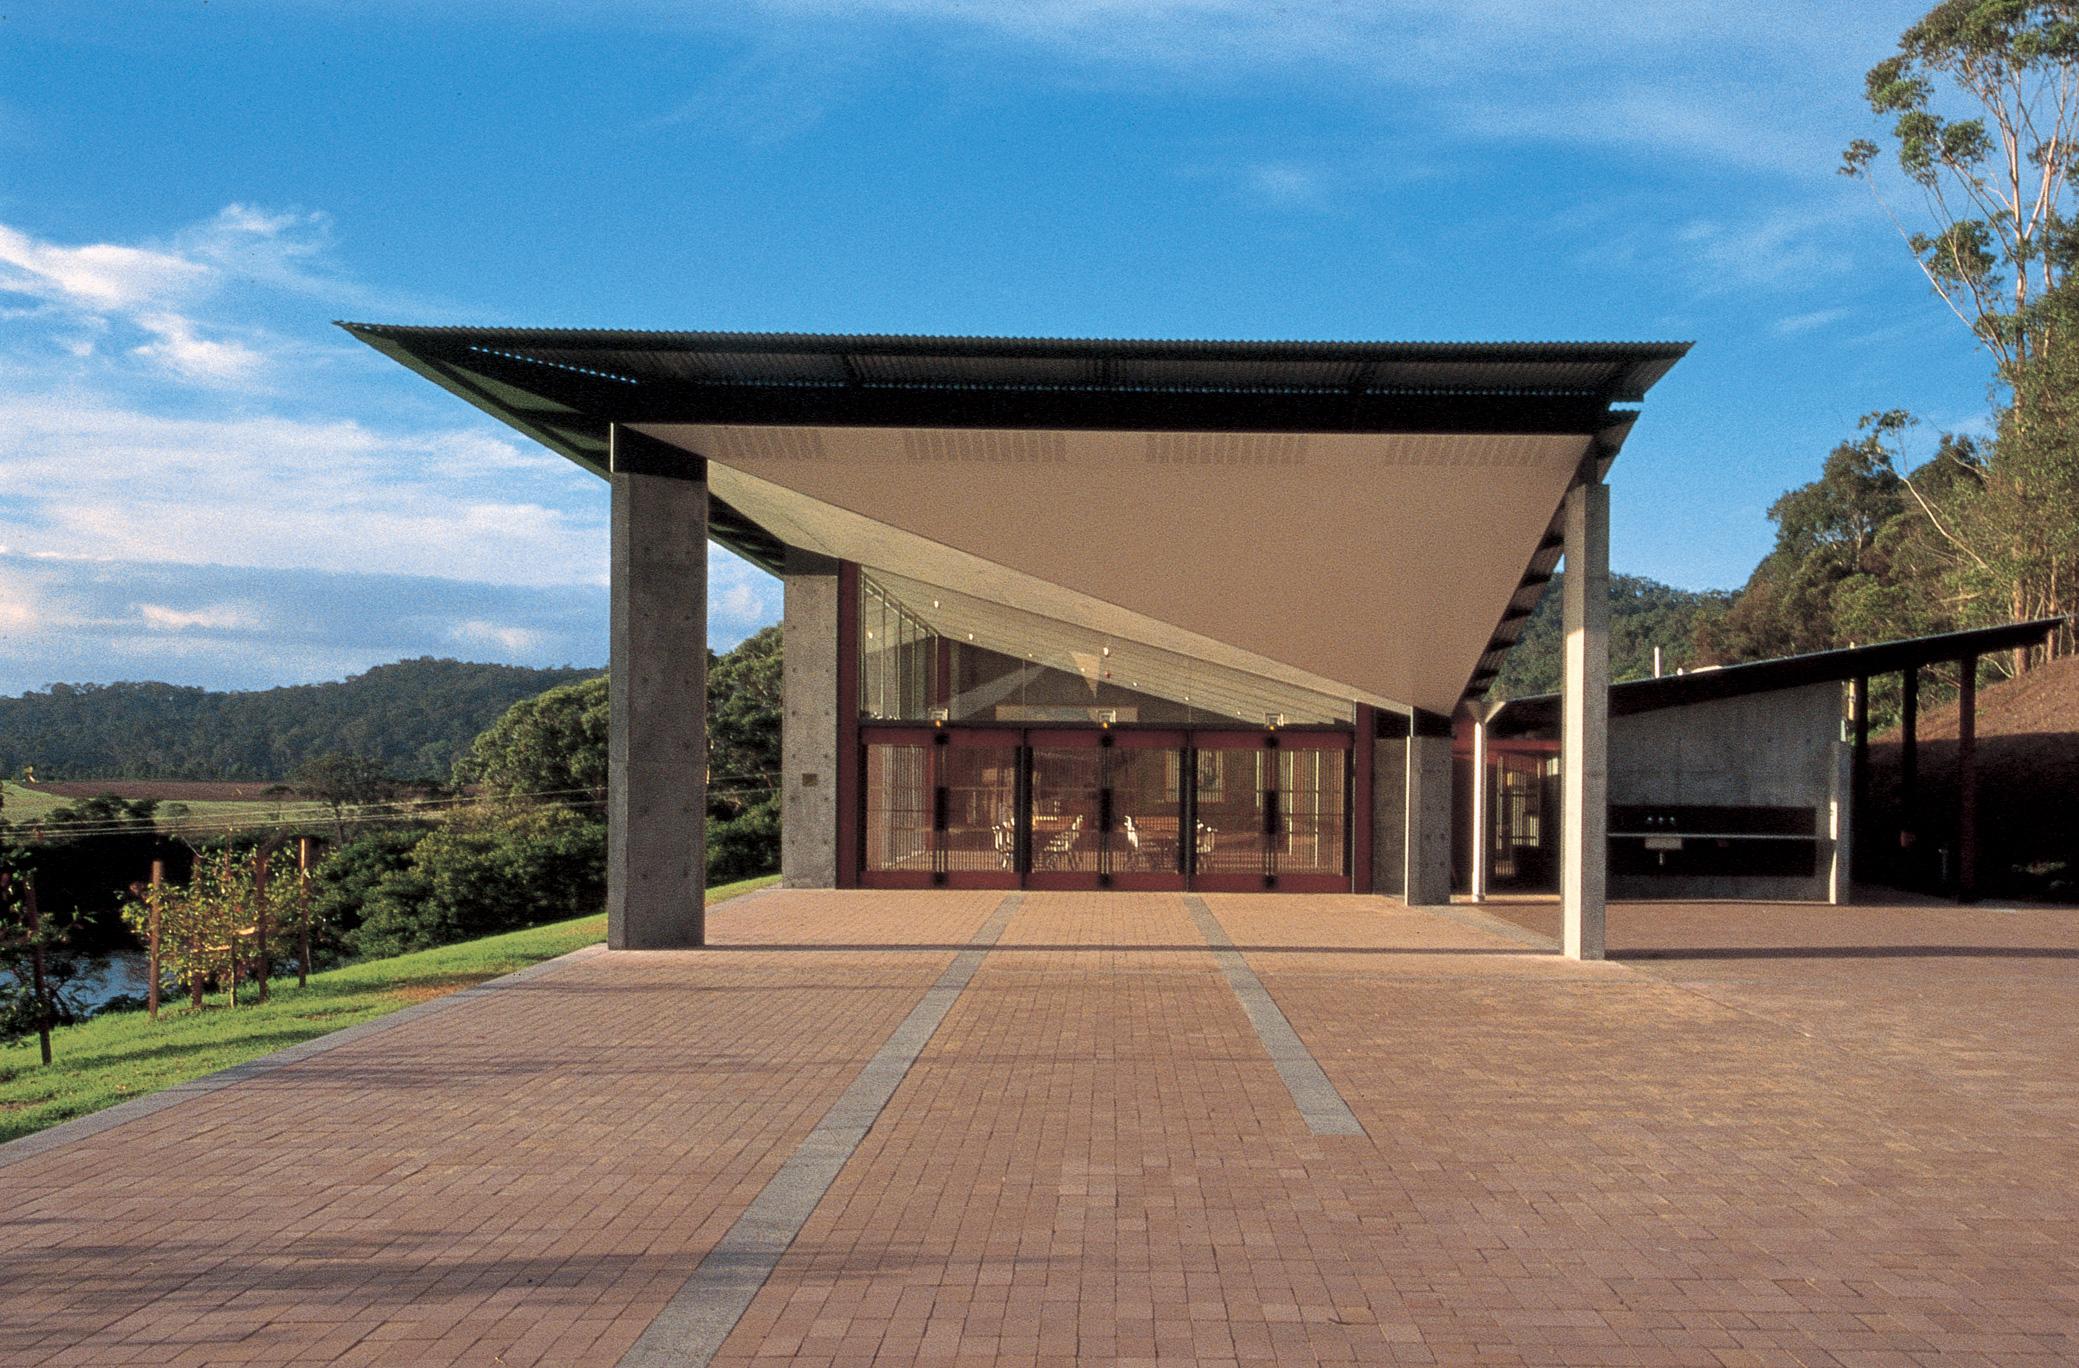 La profession l 39 international ordre des architectes for Ordre des architectes centre